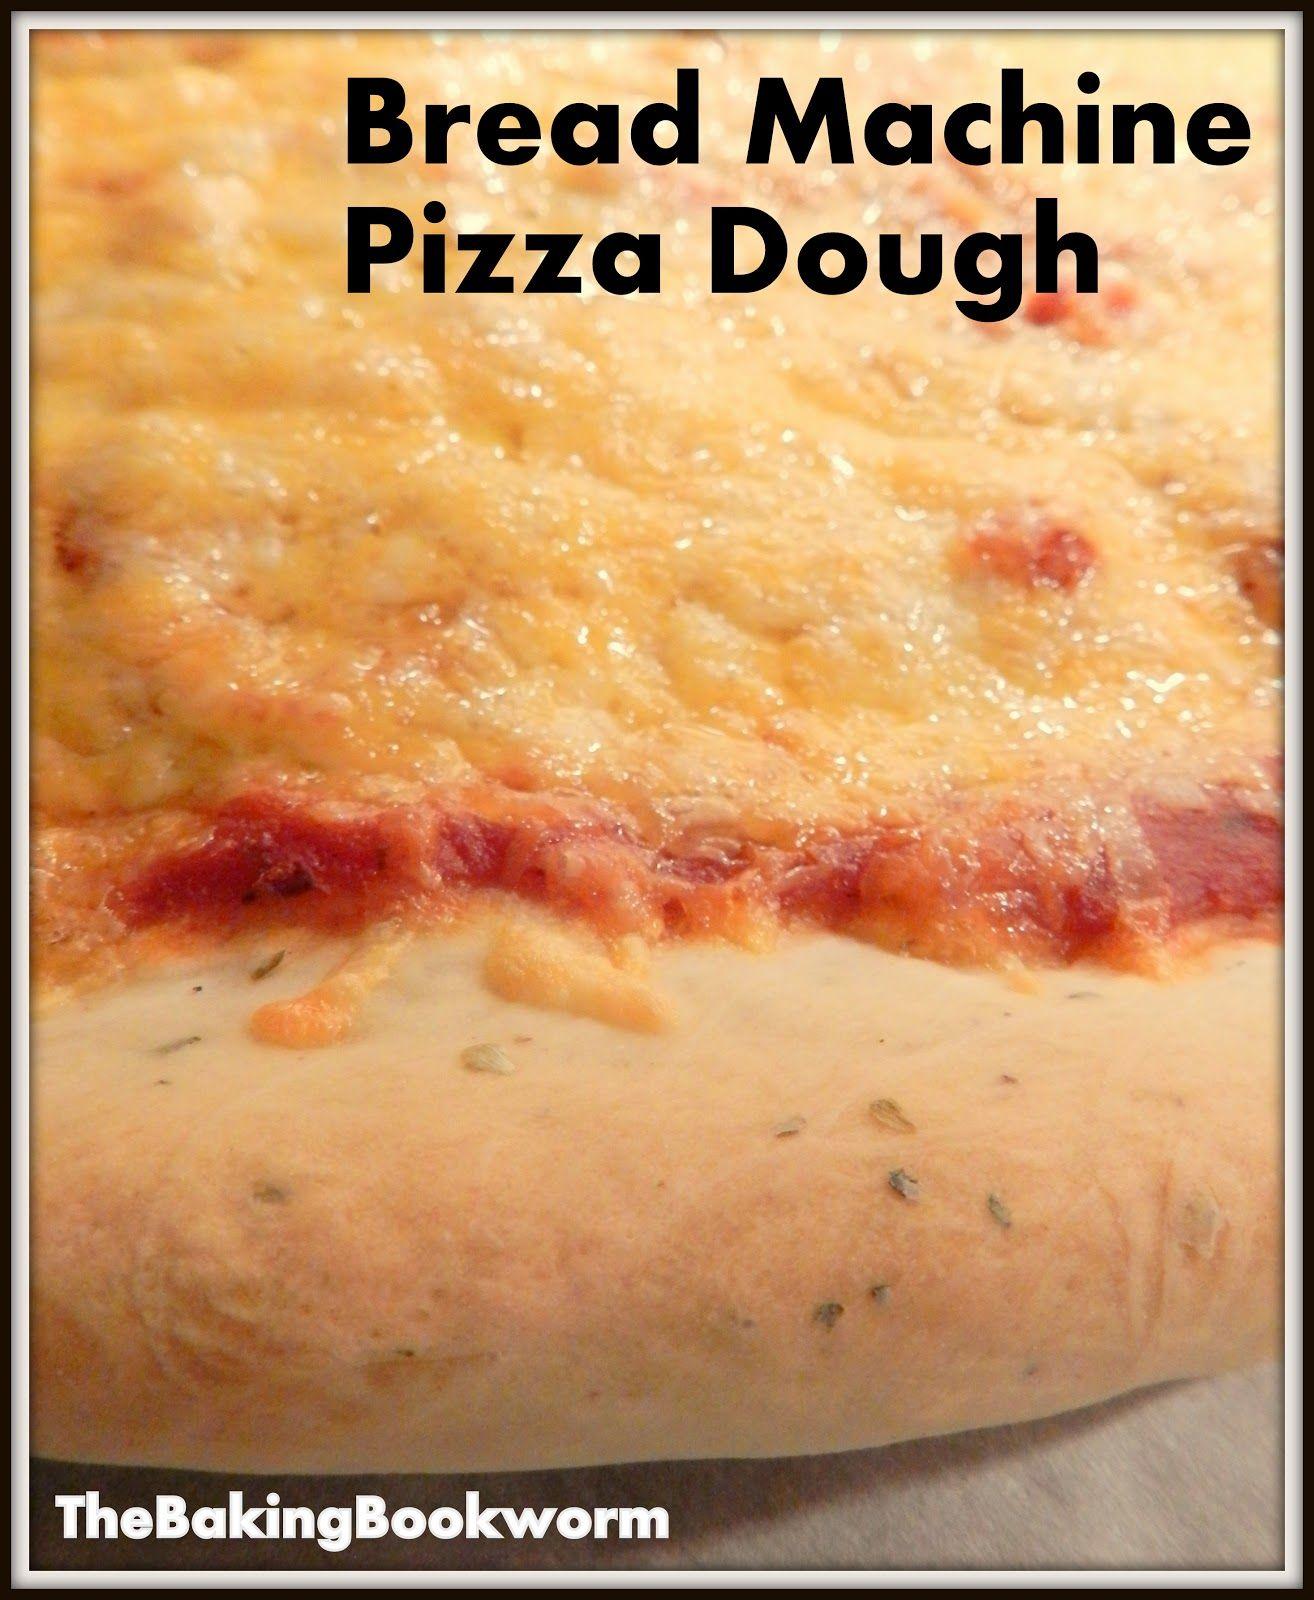 Bread Machine Pizza Dough {The Baking Bookworm} I've been ...